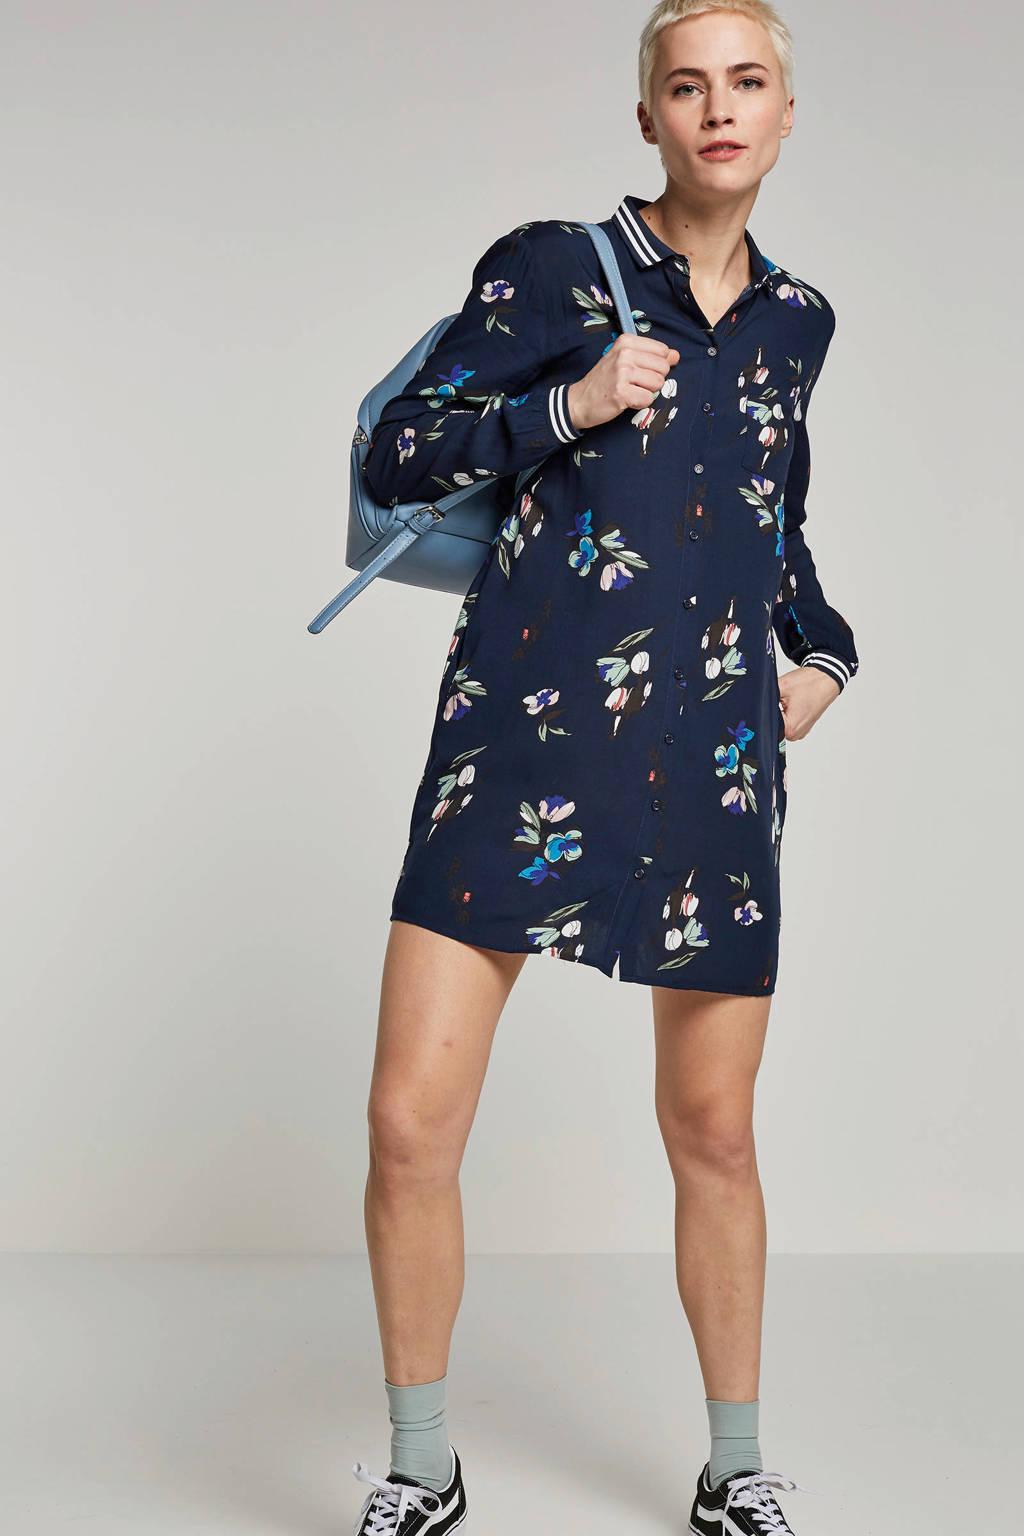 FREEQUENT blouse met bloemenprint, Donkerblauw